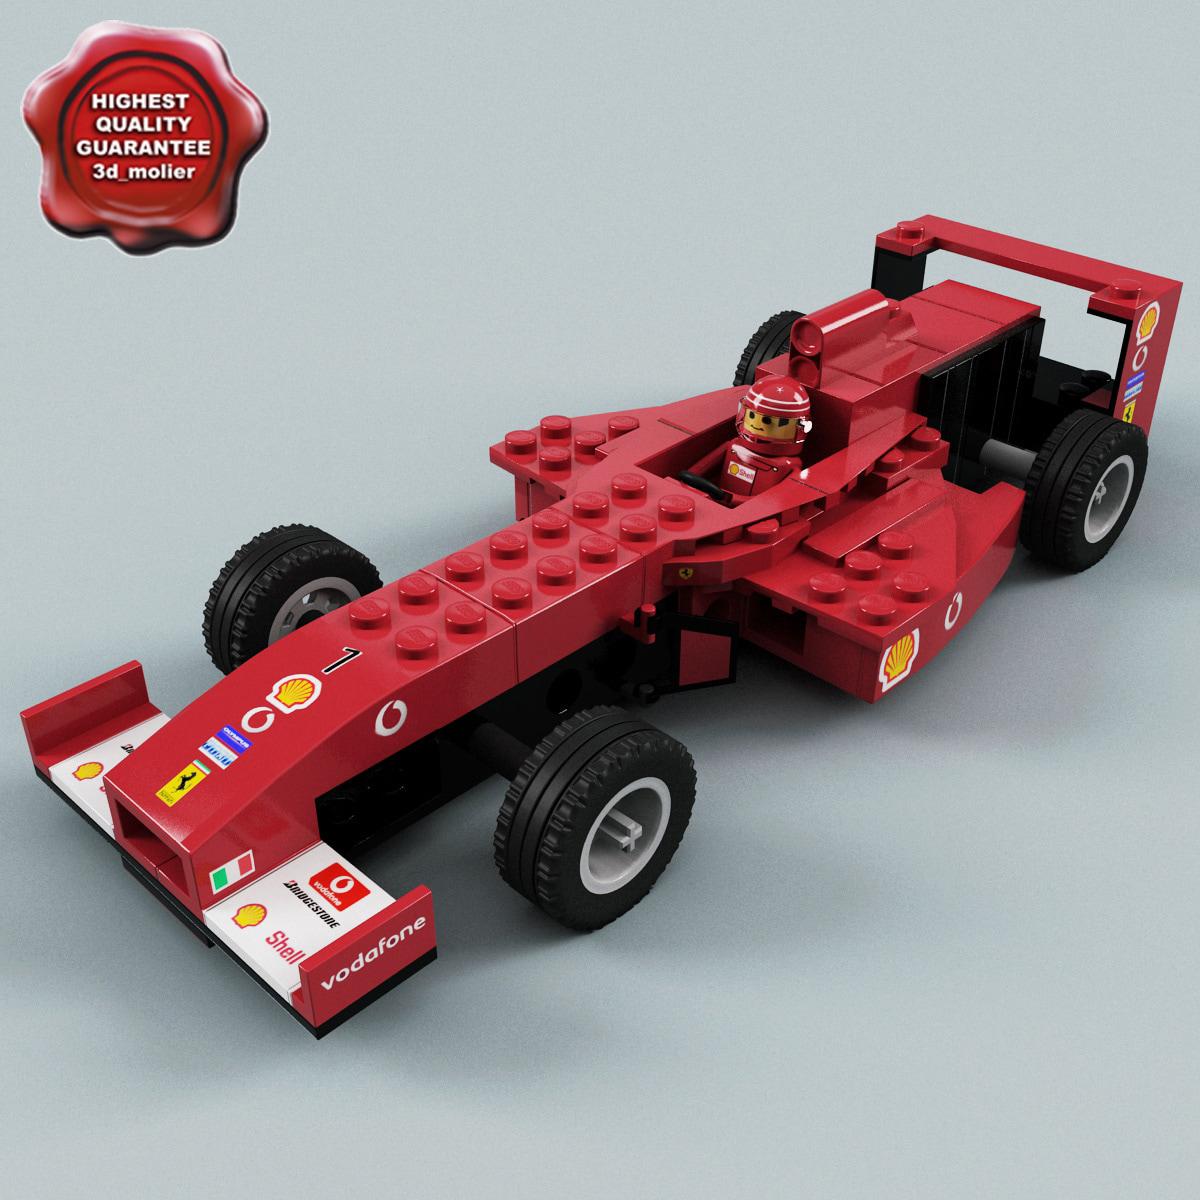 Lego_Racing_Car_00.jpg